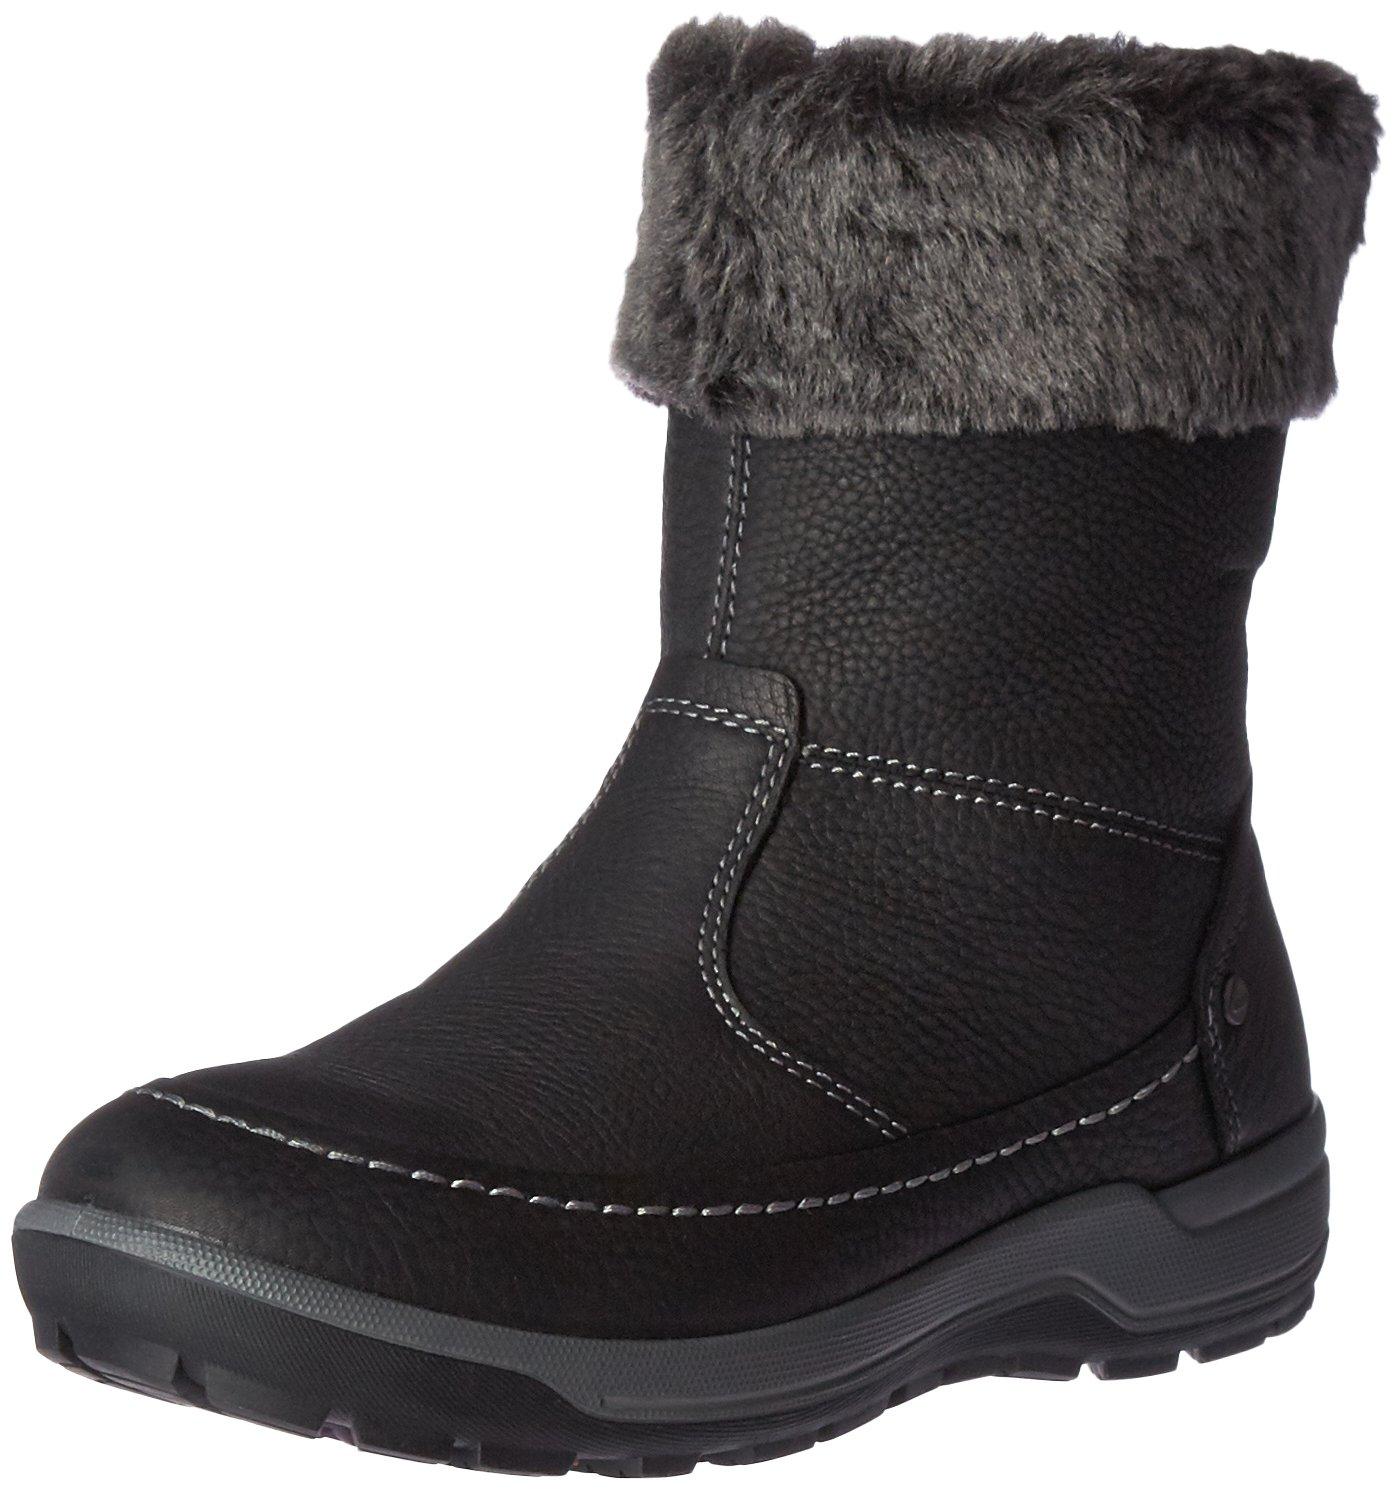 ECCO Women's Trace W Snow Boot B01A1JO89S 42 EU/11-11.5 M US|Black/Dark Shadow